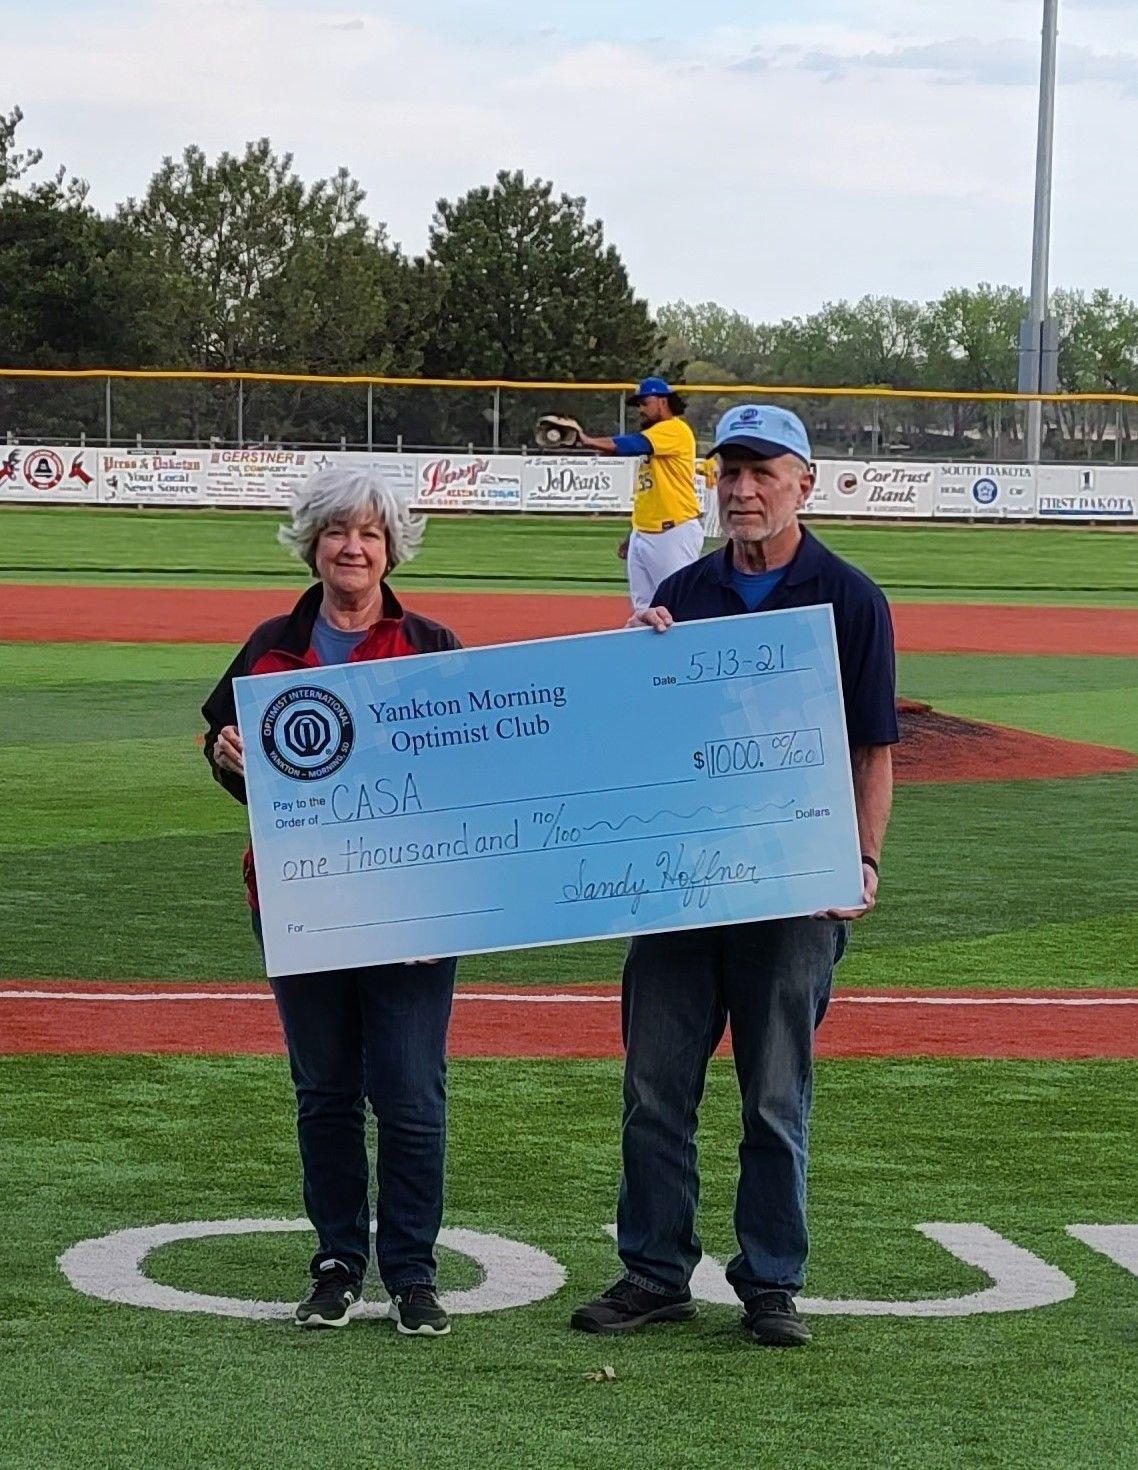 Yankton Optimist Club Donates to CASA